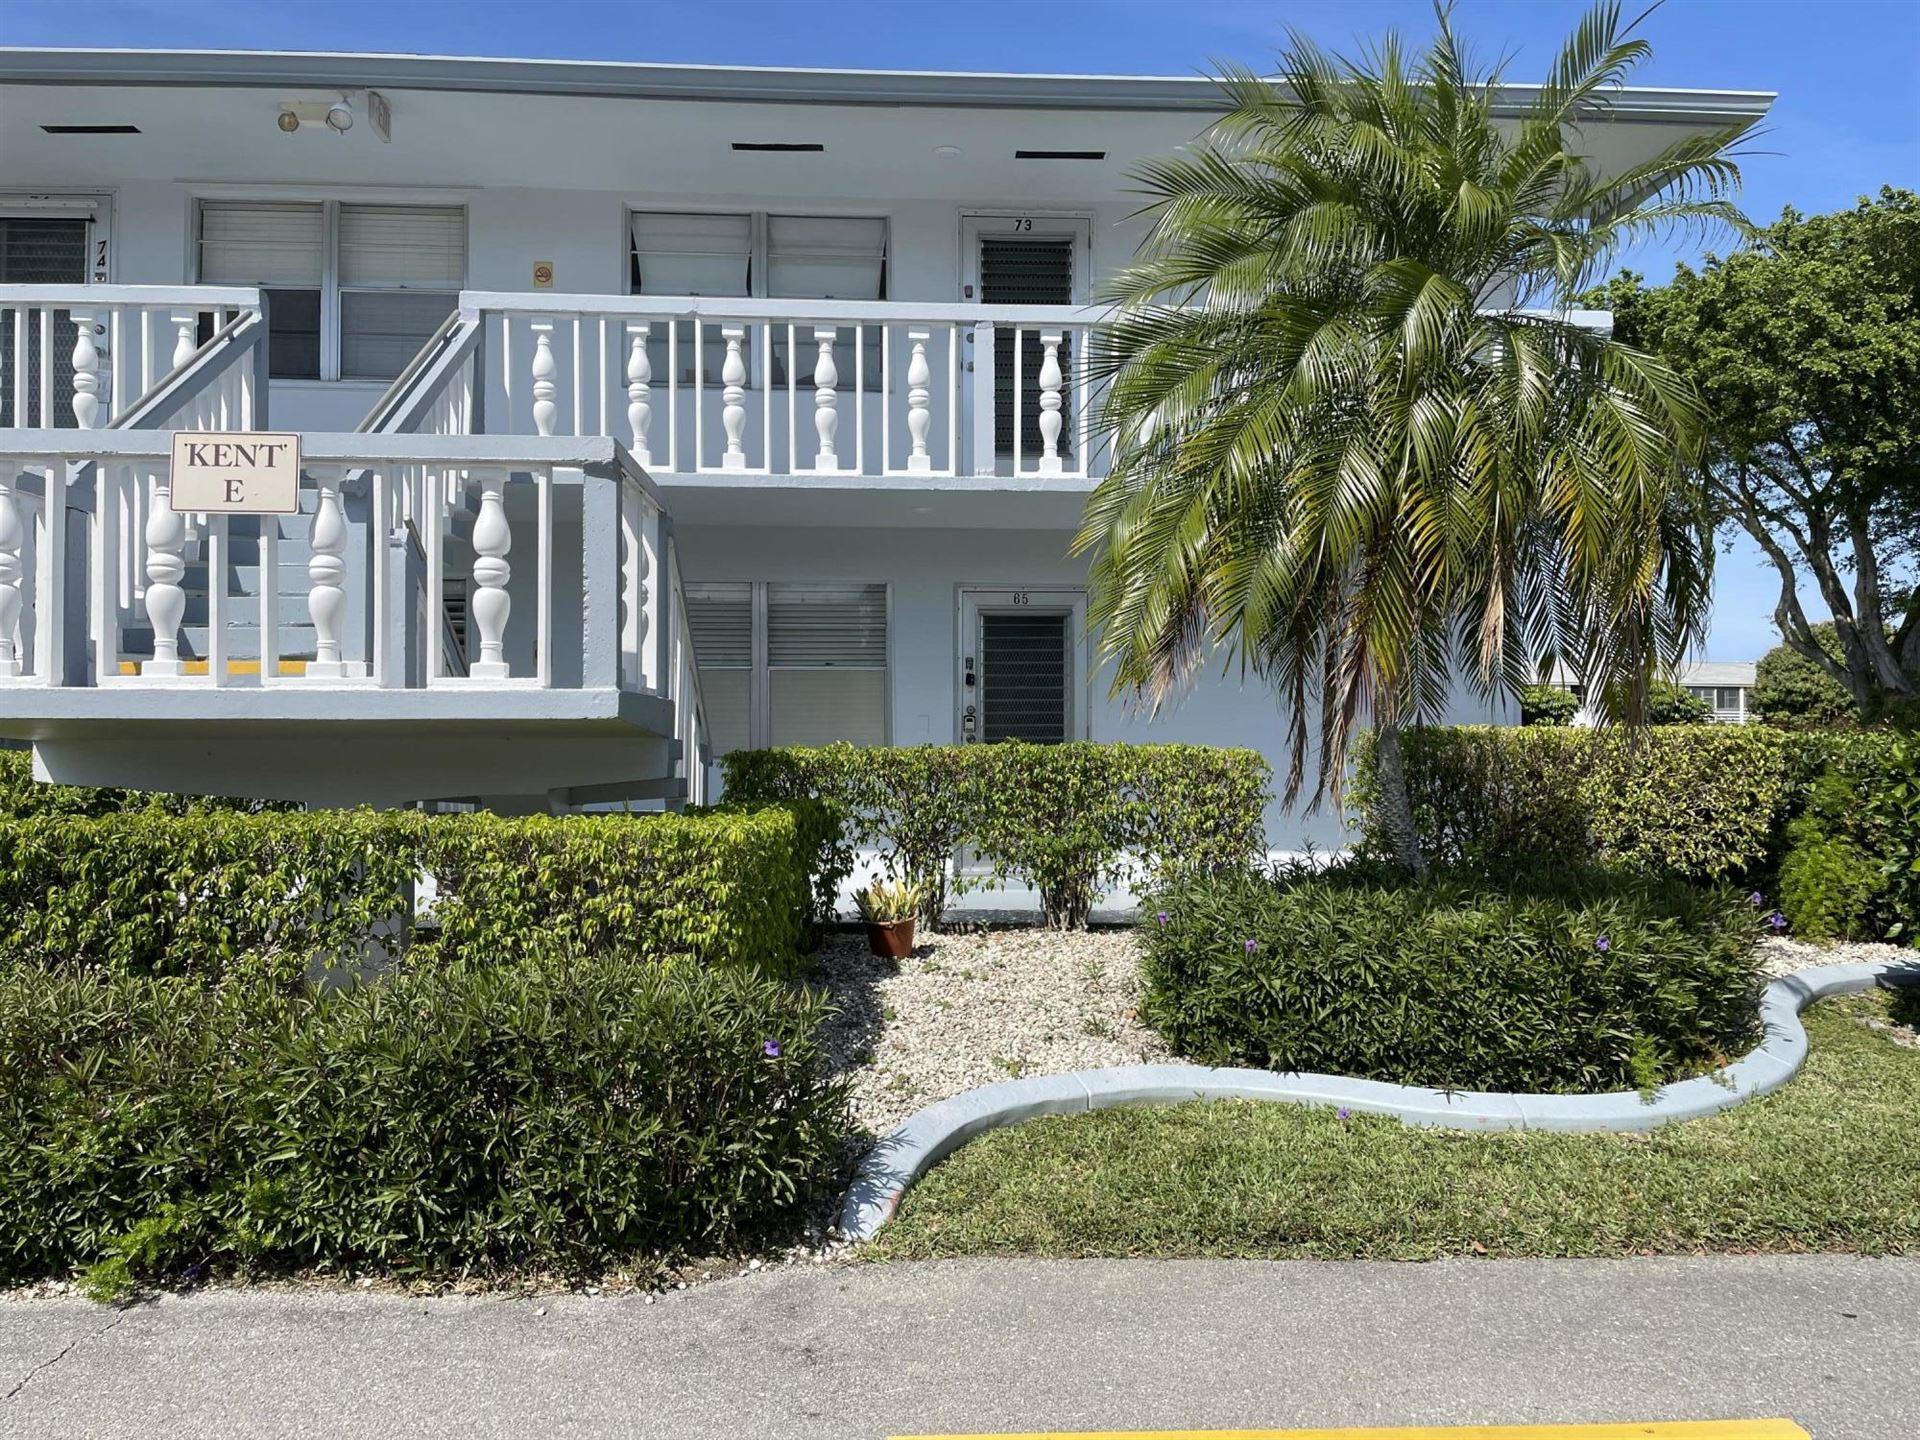 65 Kent E, West Palm Beach, FL 33417 - MLS#: RX-10700853